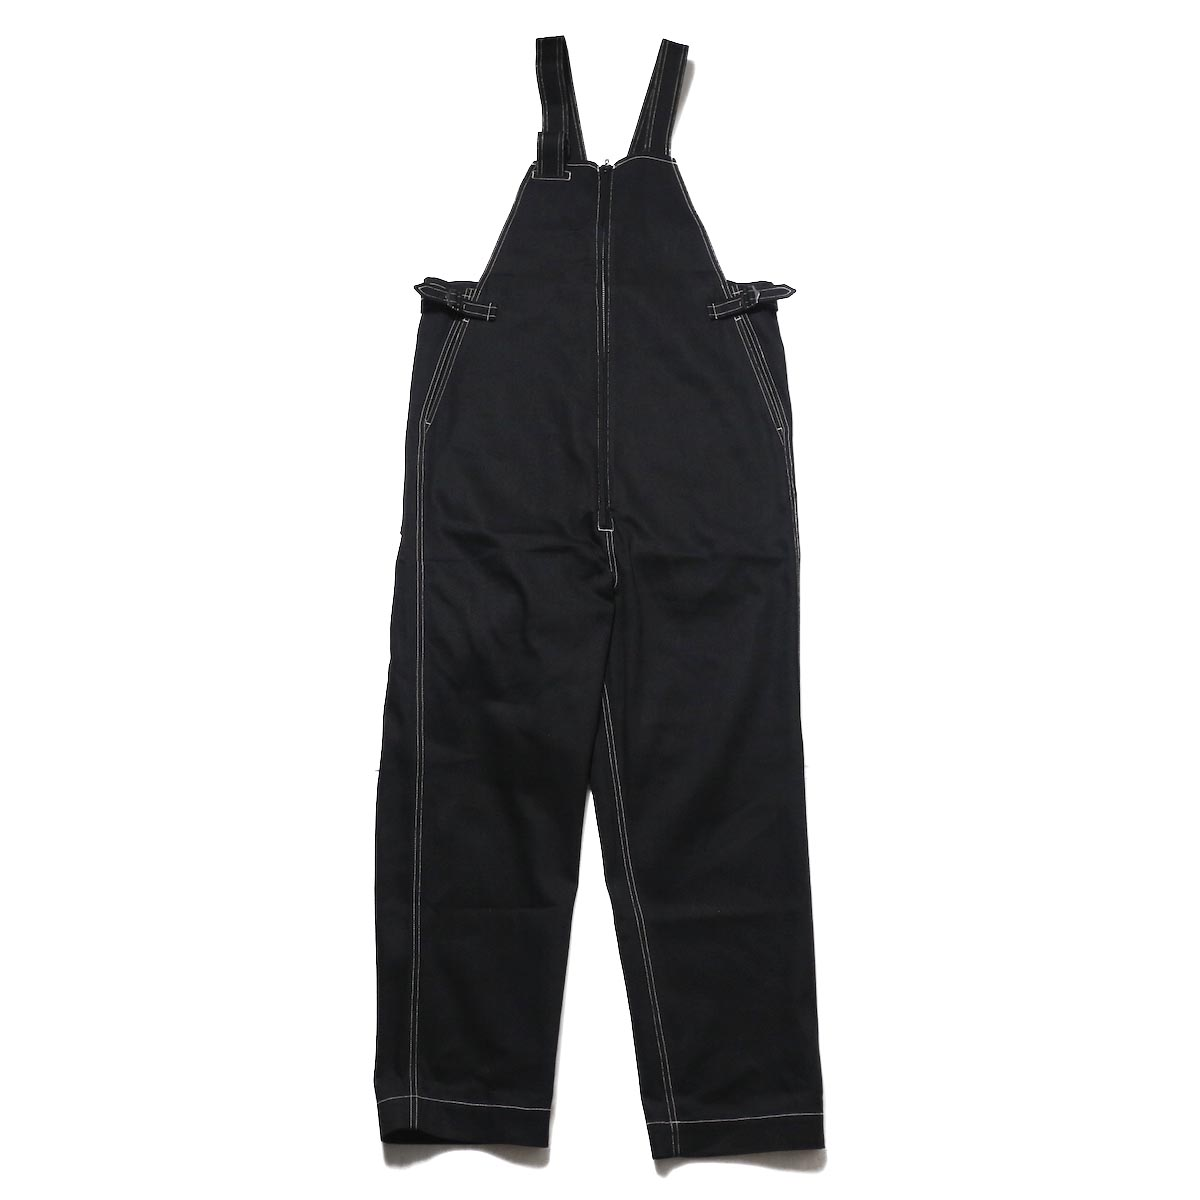 blurhms / U.S Cotton Denim Overalls (Black)